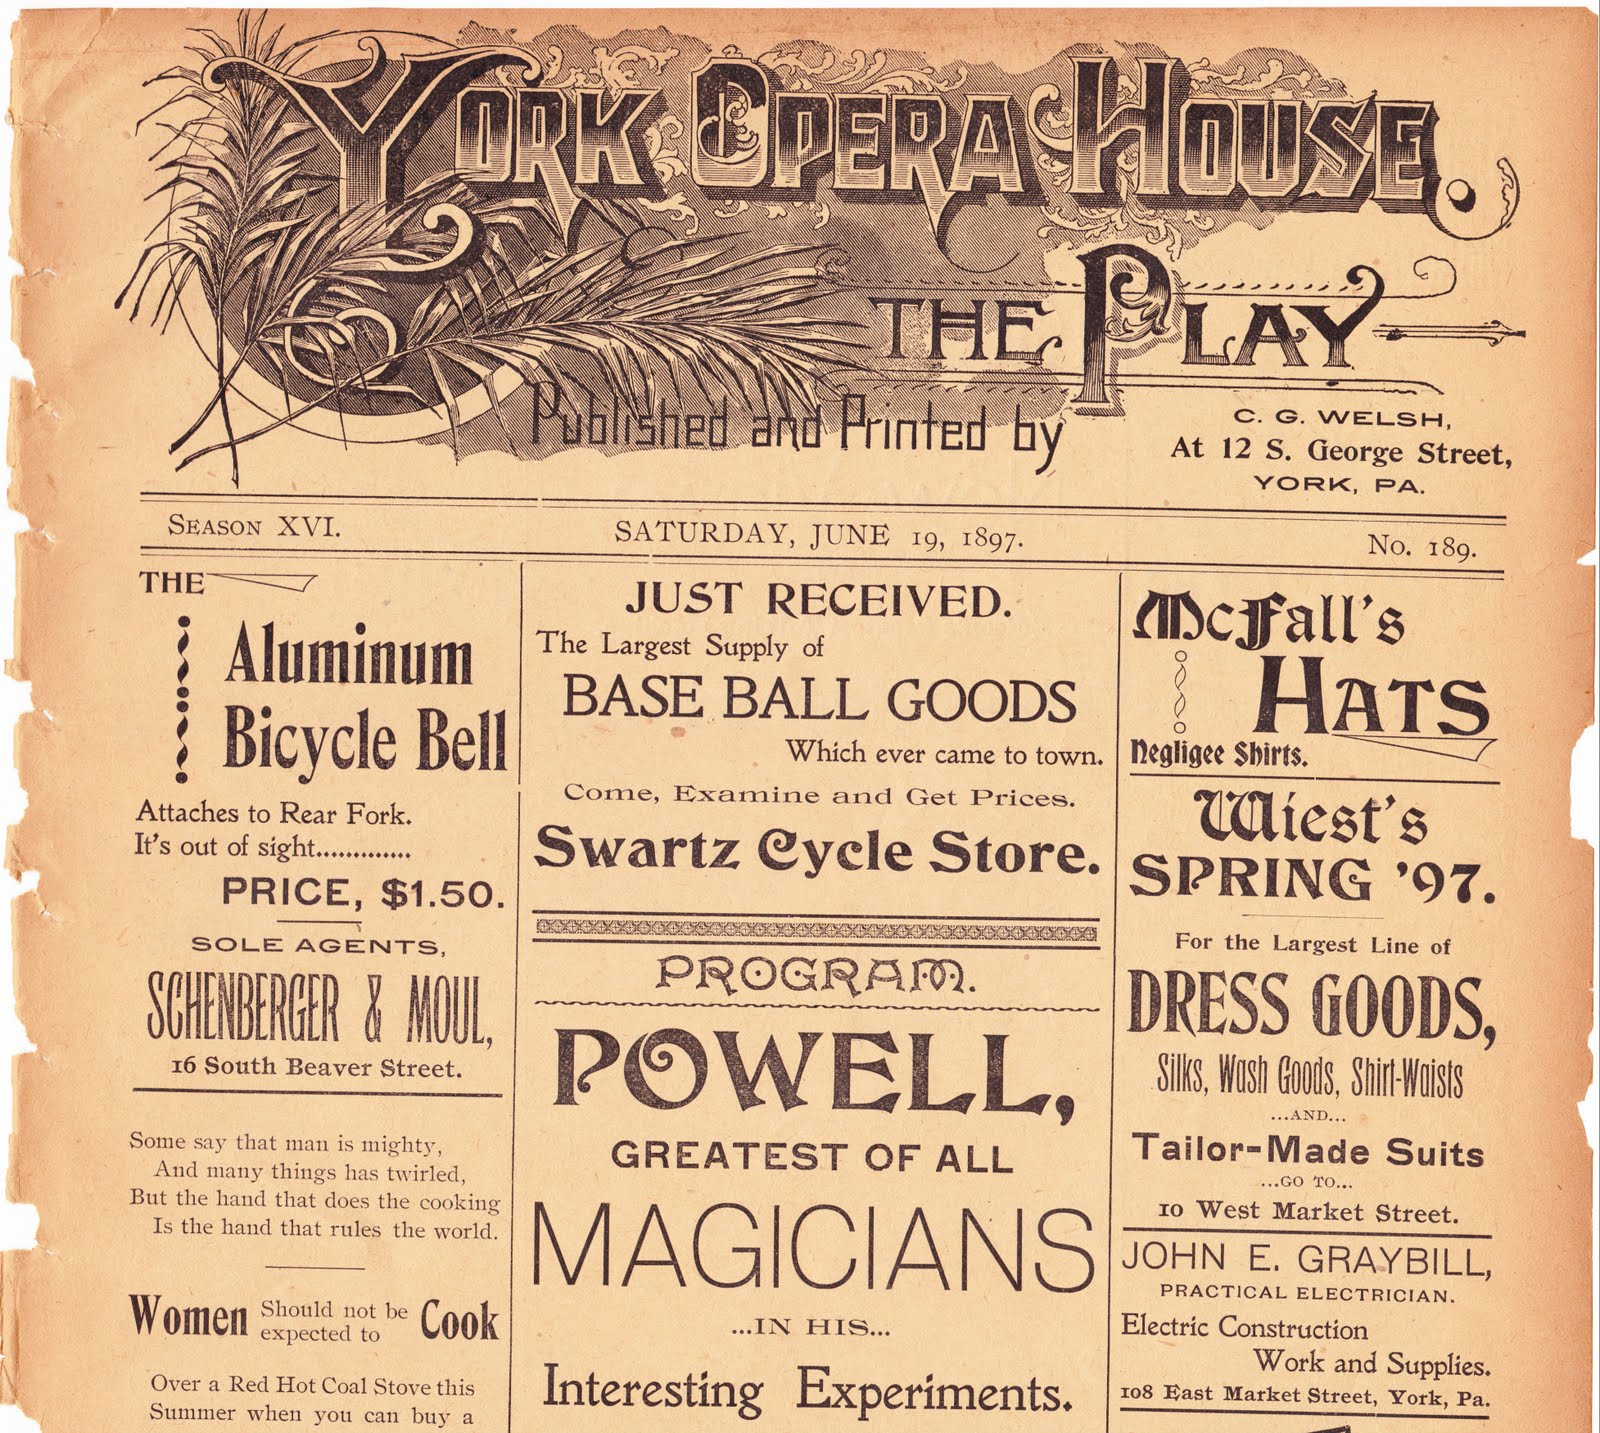 Papergreat: 1897 York Opera House program, Part 1